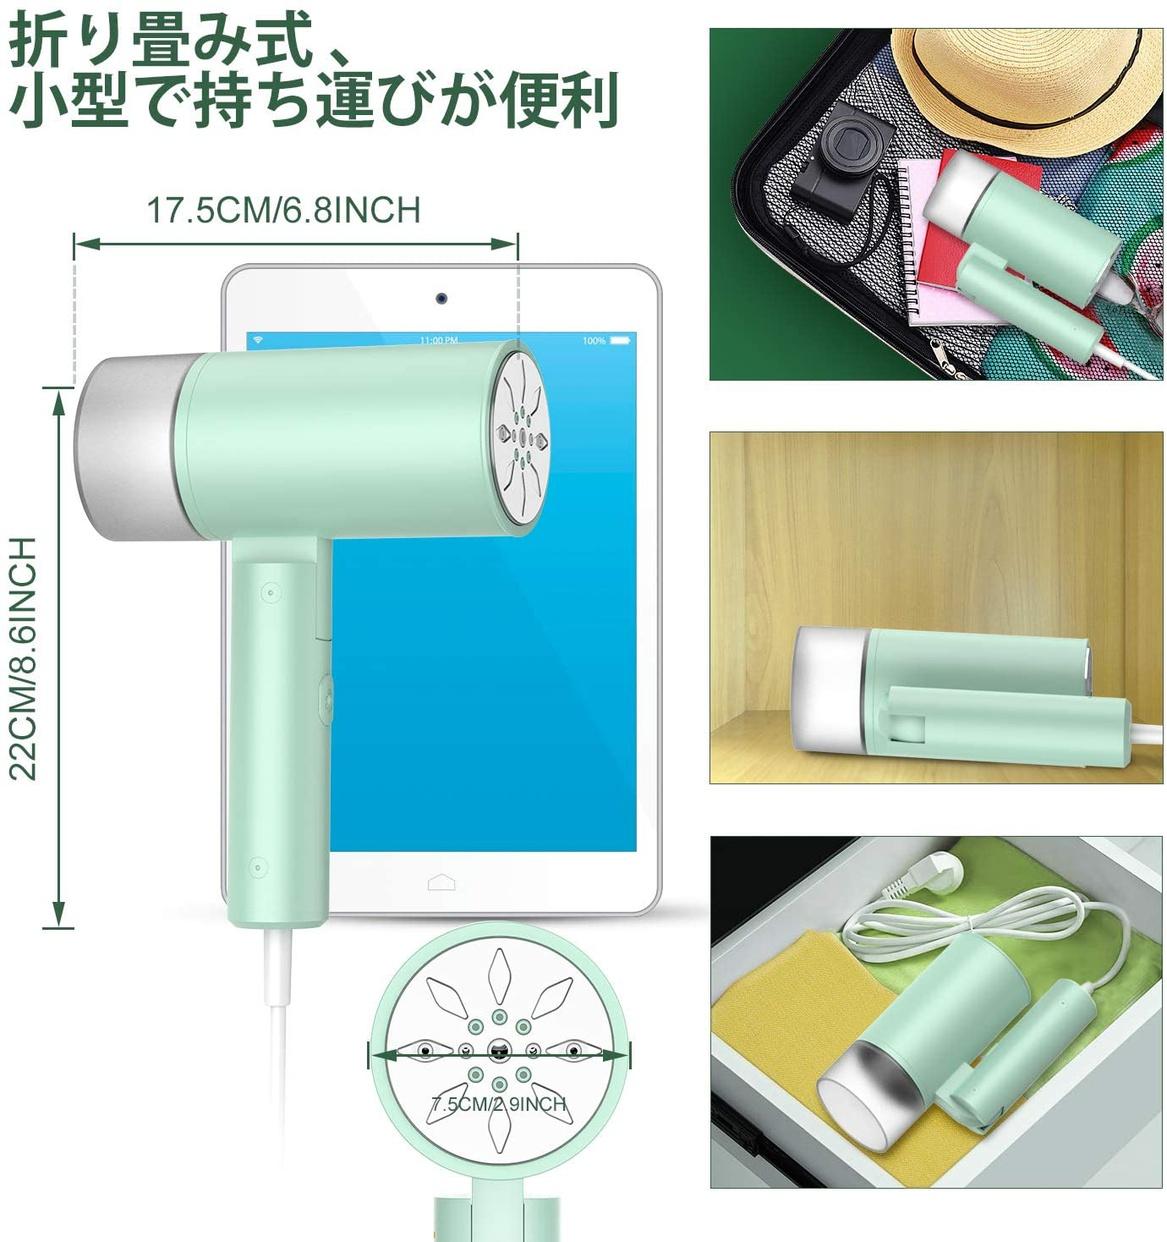 PAIPU(パイプ) 衣類スチーマーの商品画像3